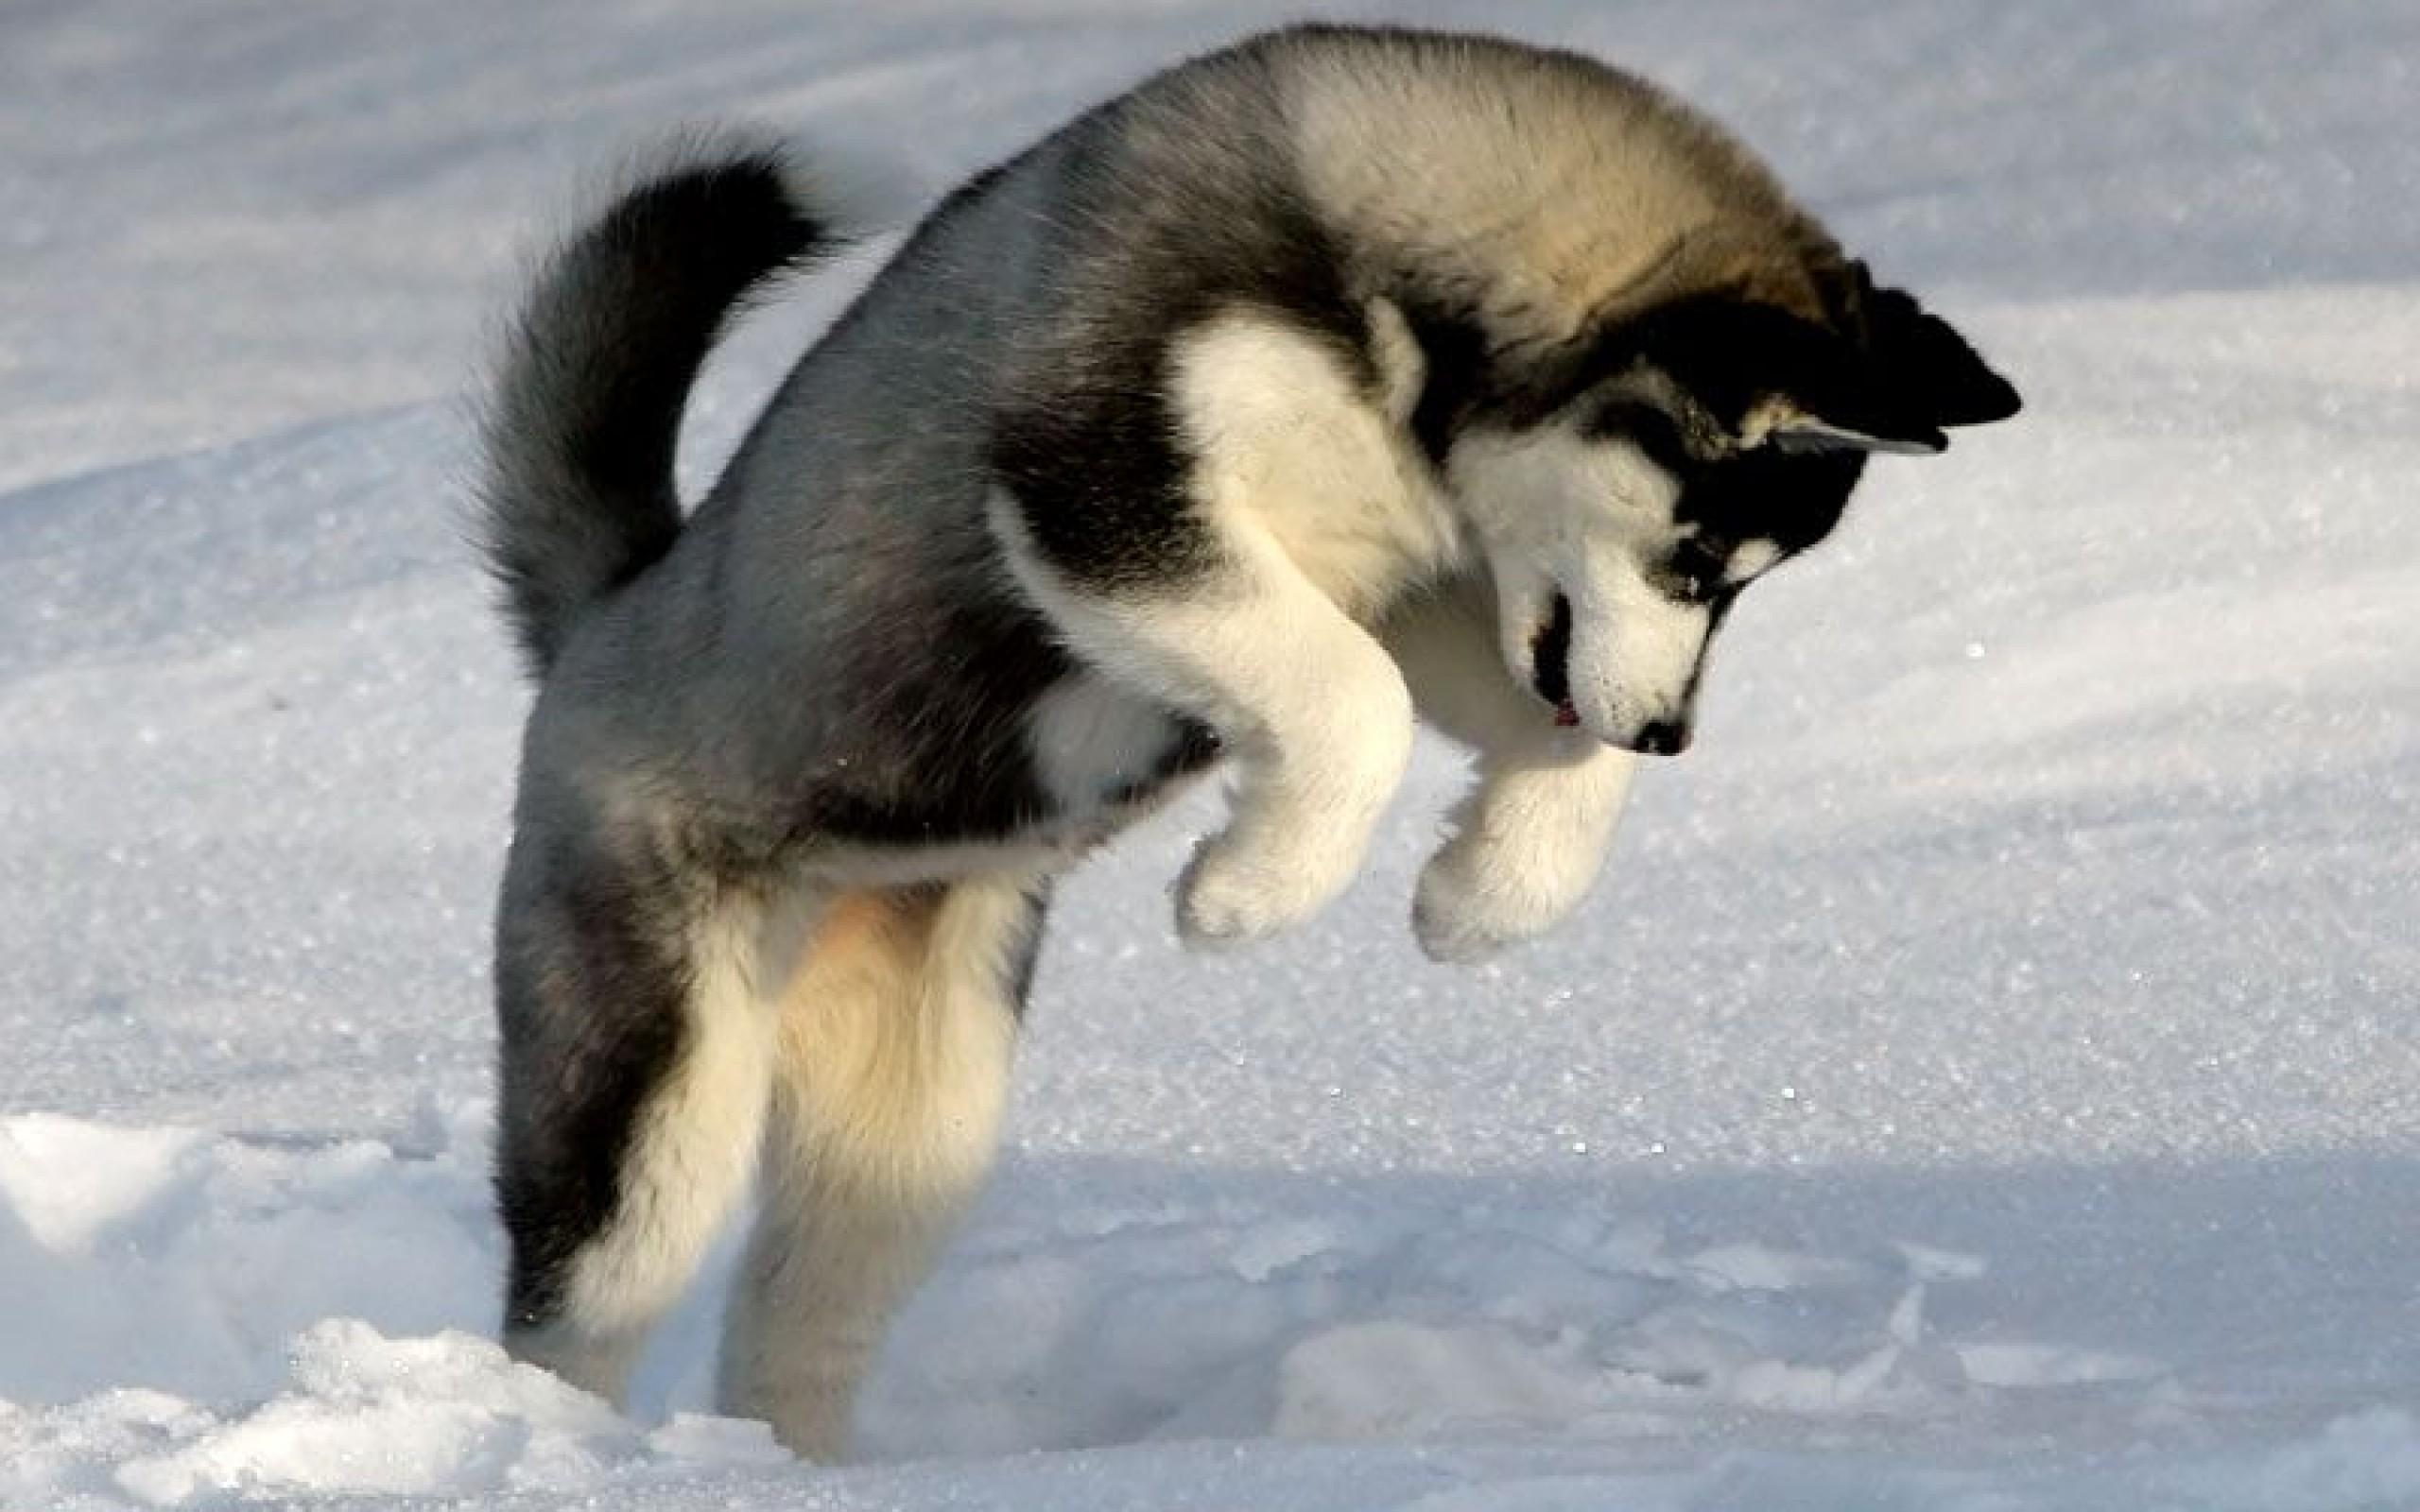 Husky Puppies Wallpapers Pc 2560x1600 Wallpaper Teahub Io